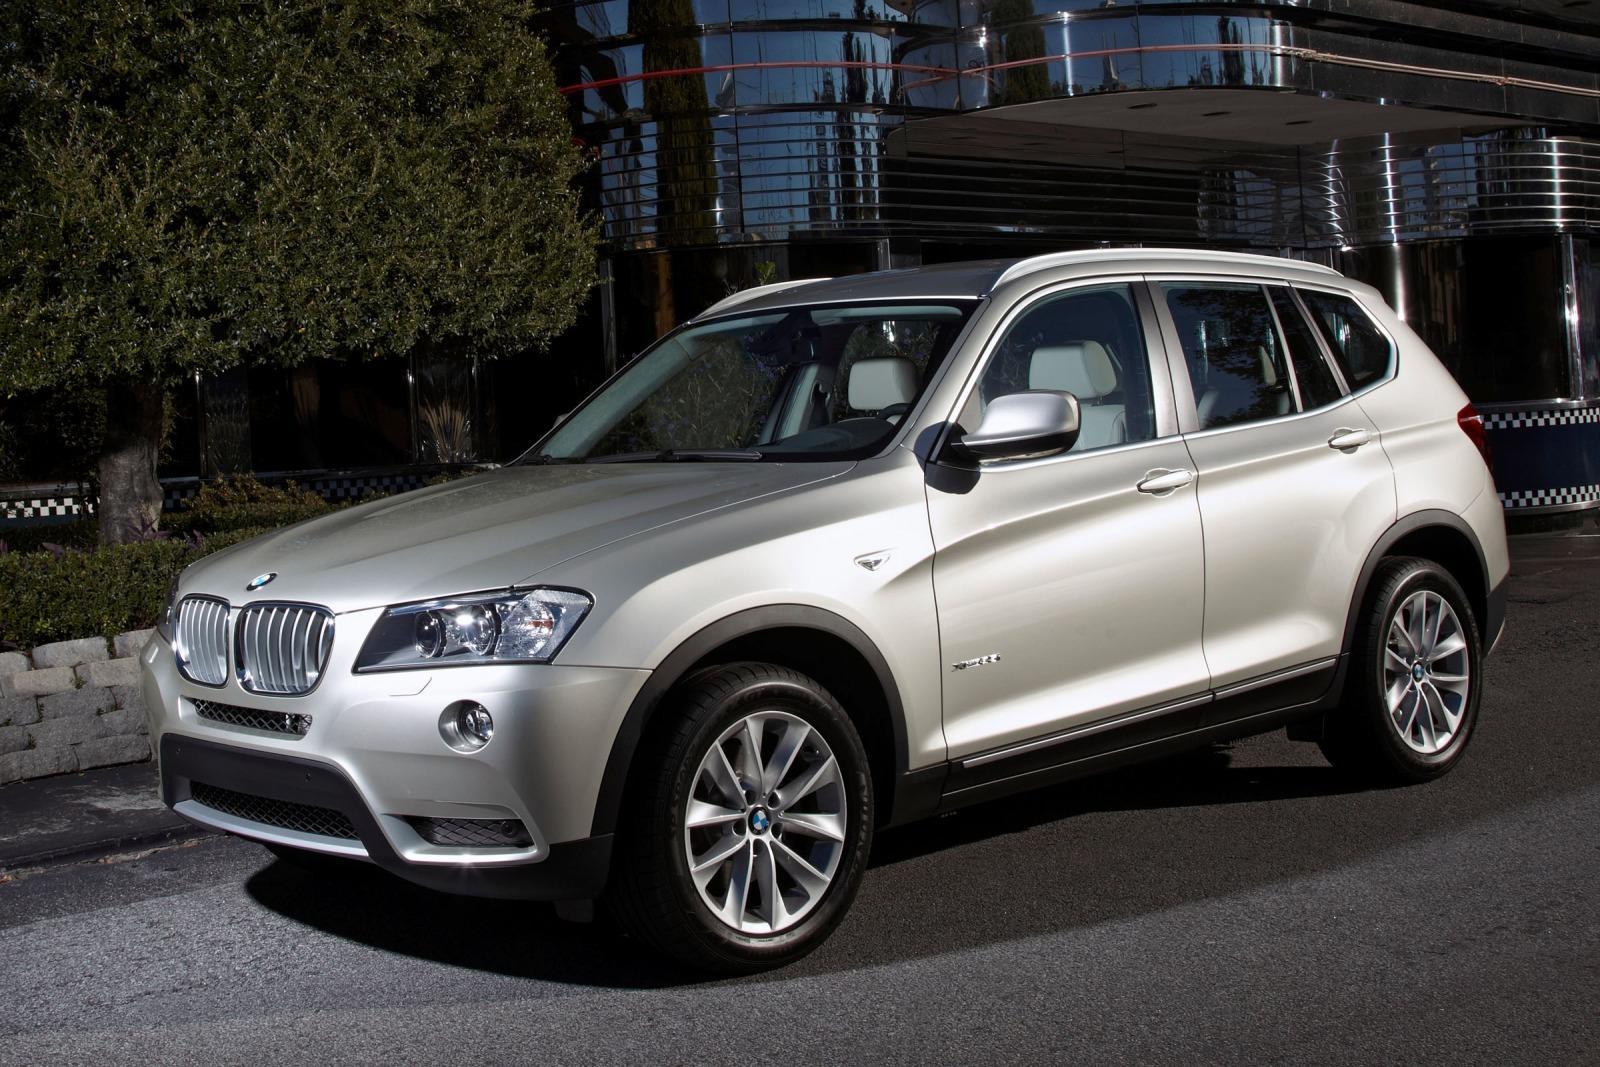 800 1024 1280 1600 Origin 2012 BMW X3